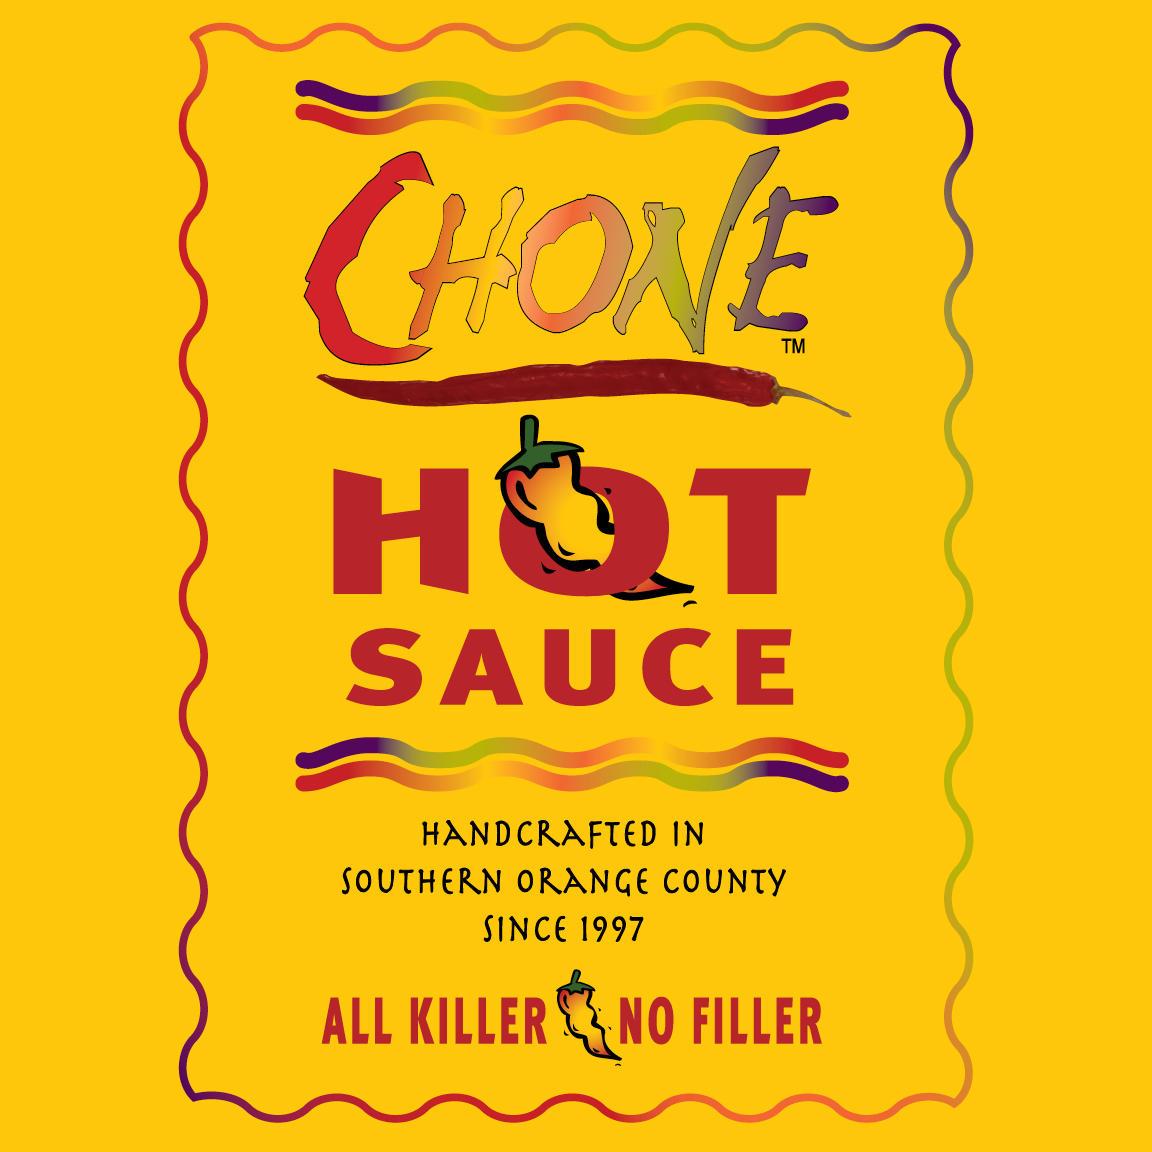 Chone Hot Sauce, Inc